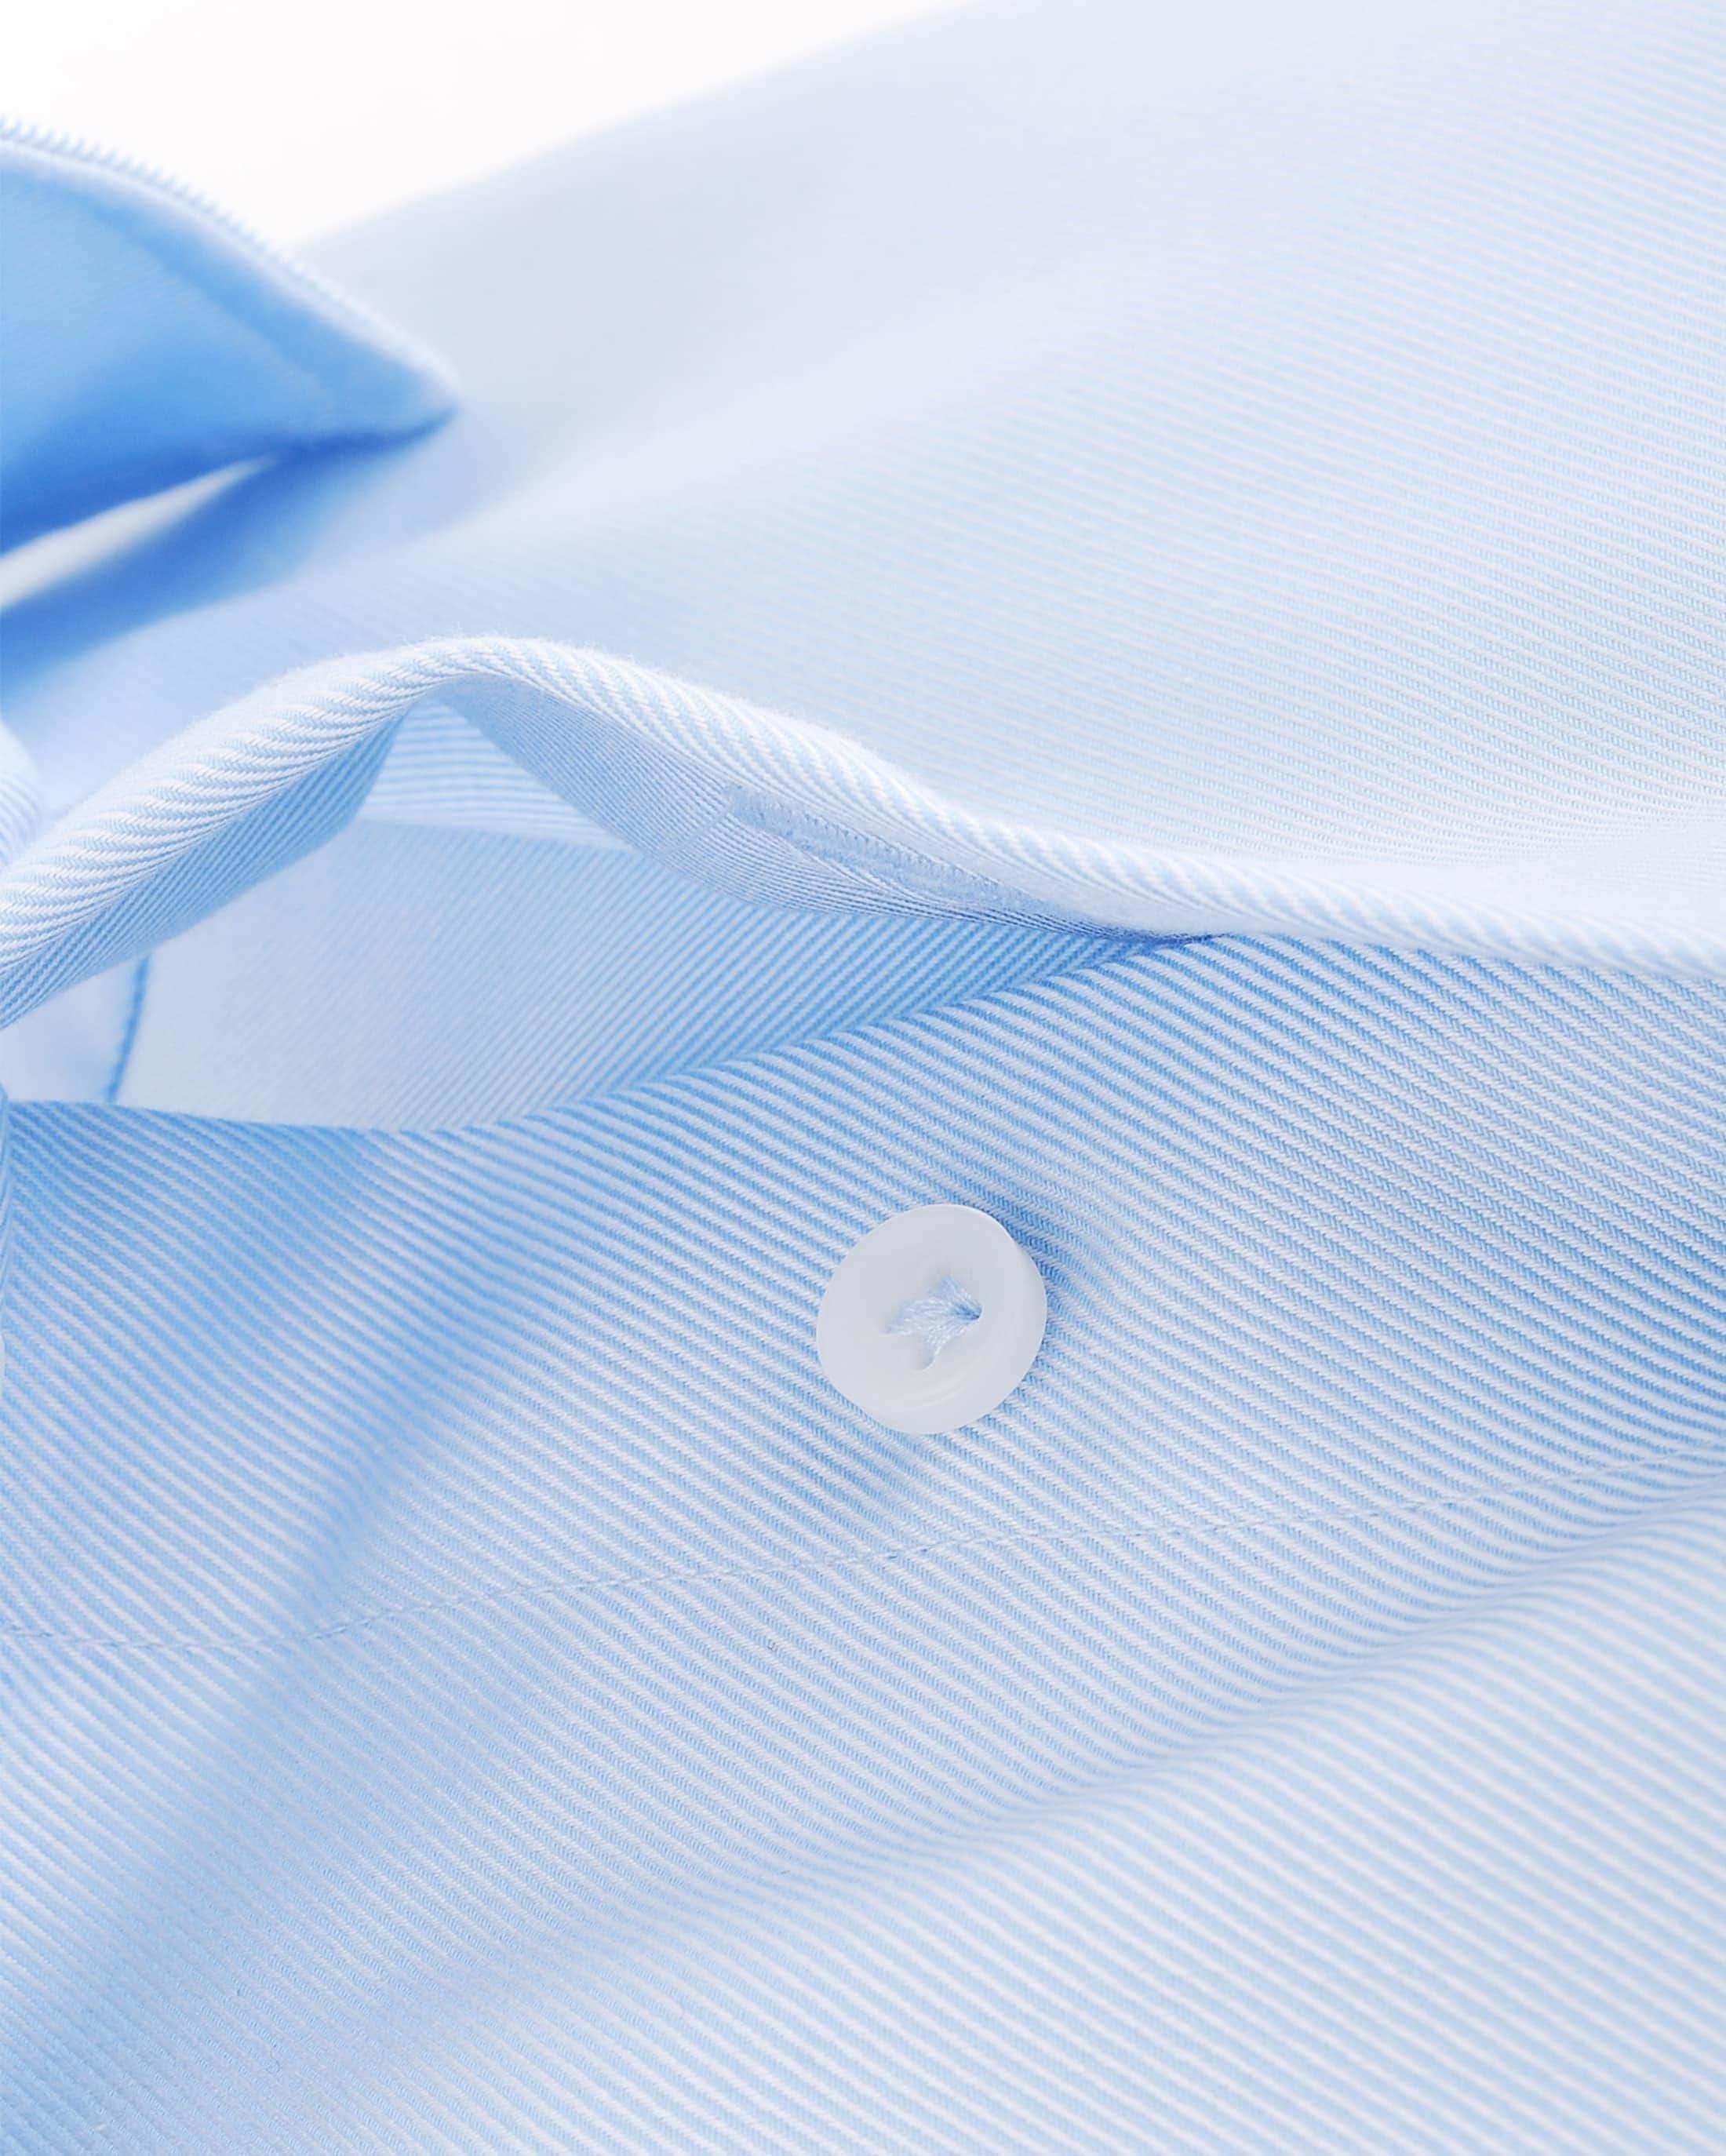 Profuomo Overhemd Blauw + Wit Contrast foto 2